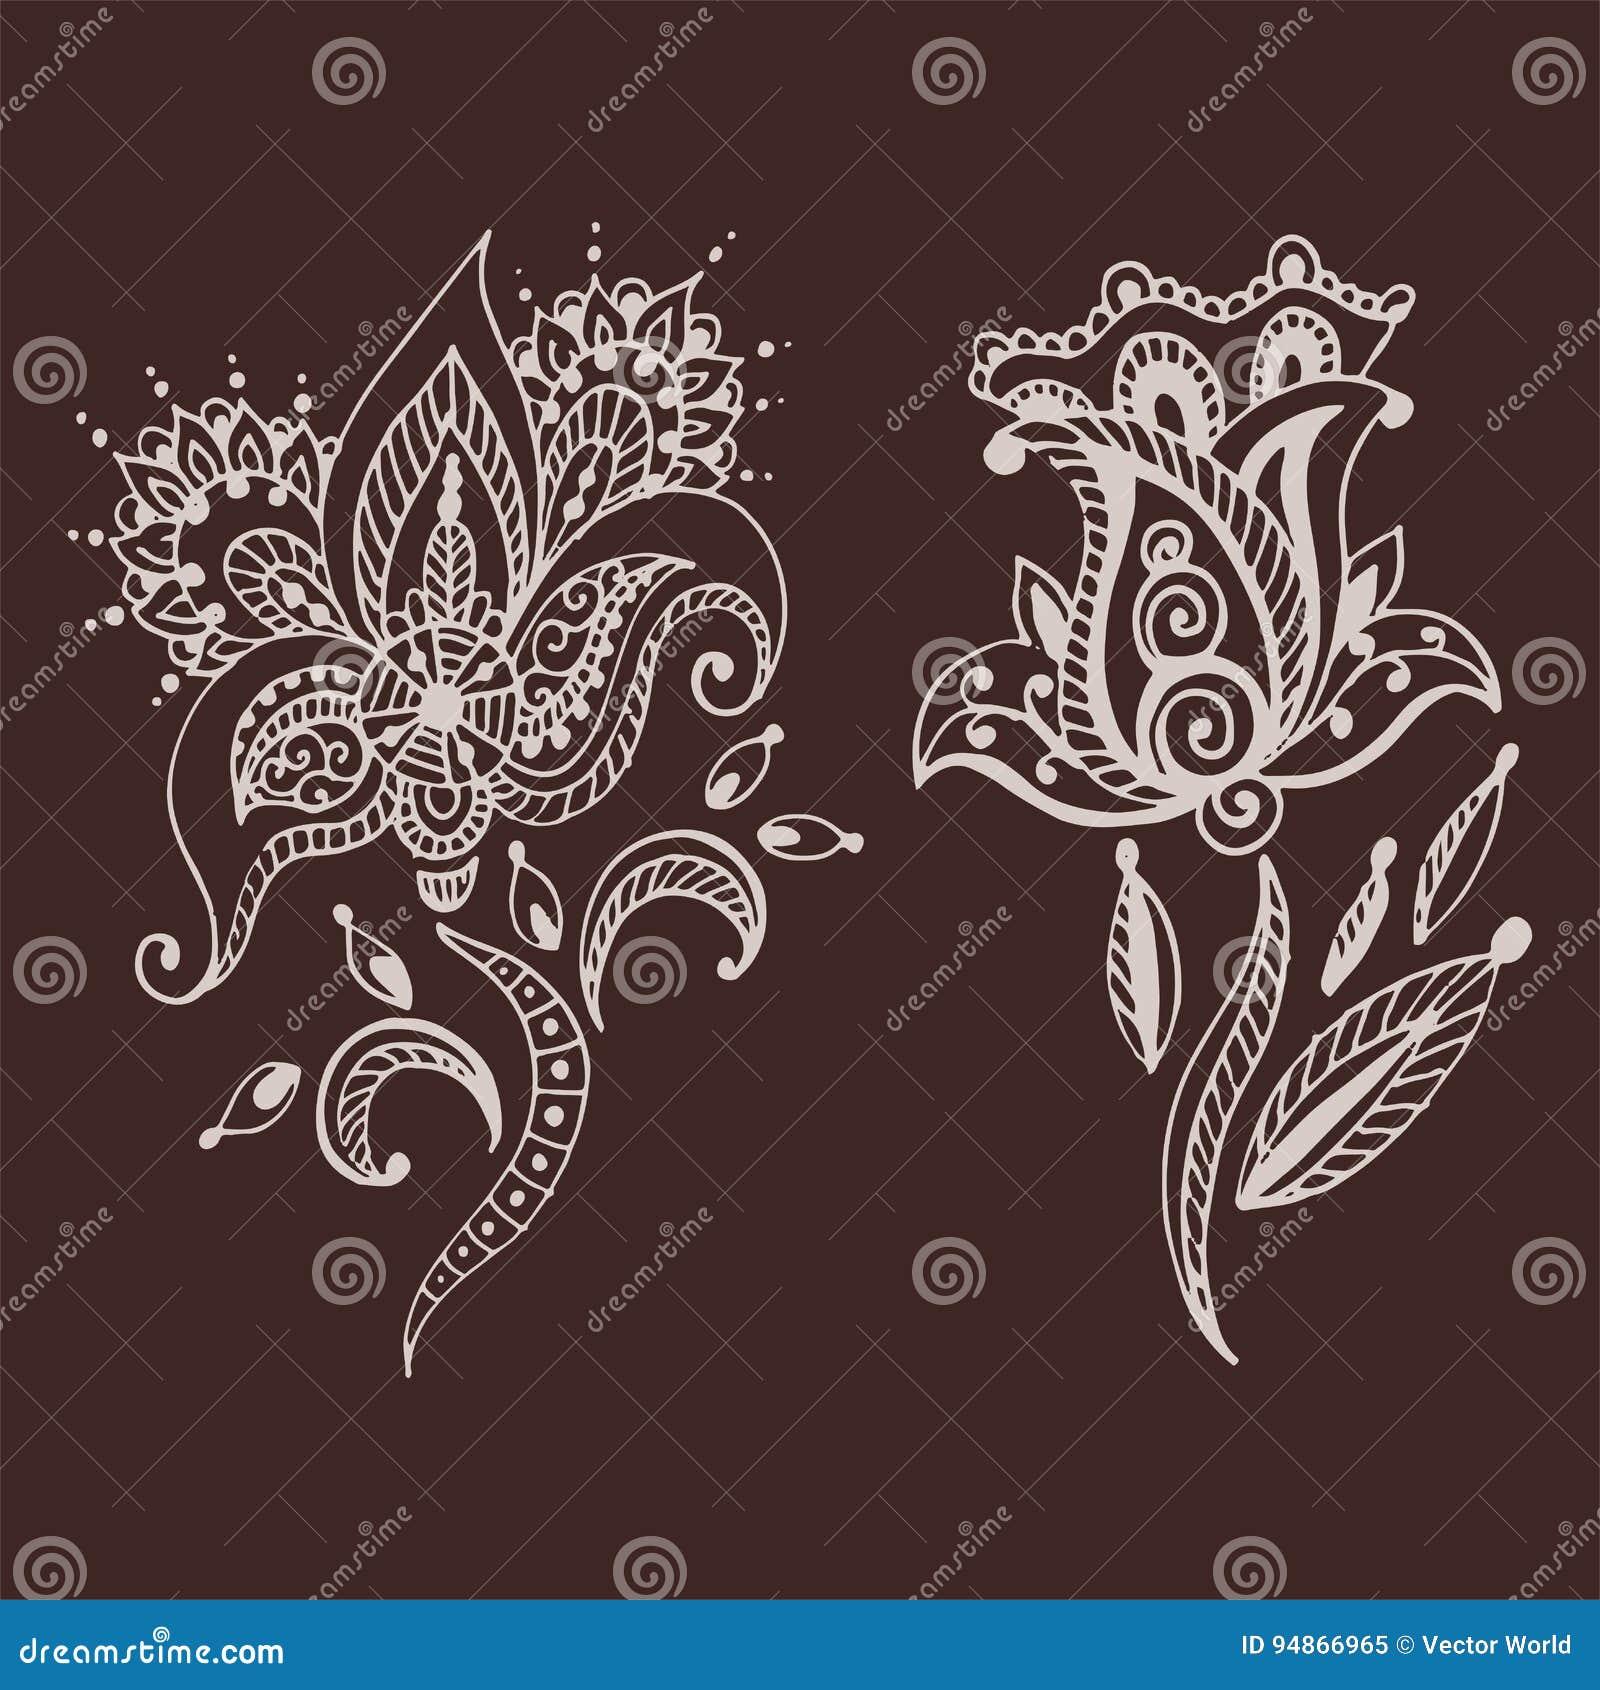 Mhendi indio decorativo ornamental del arabesque de Paisley del modelo del diseño del garabato de la flor del mehndi del marrón d